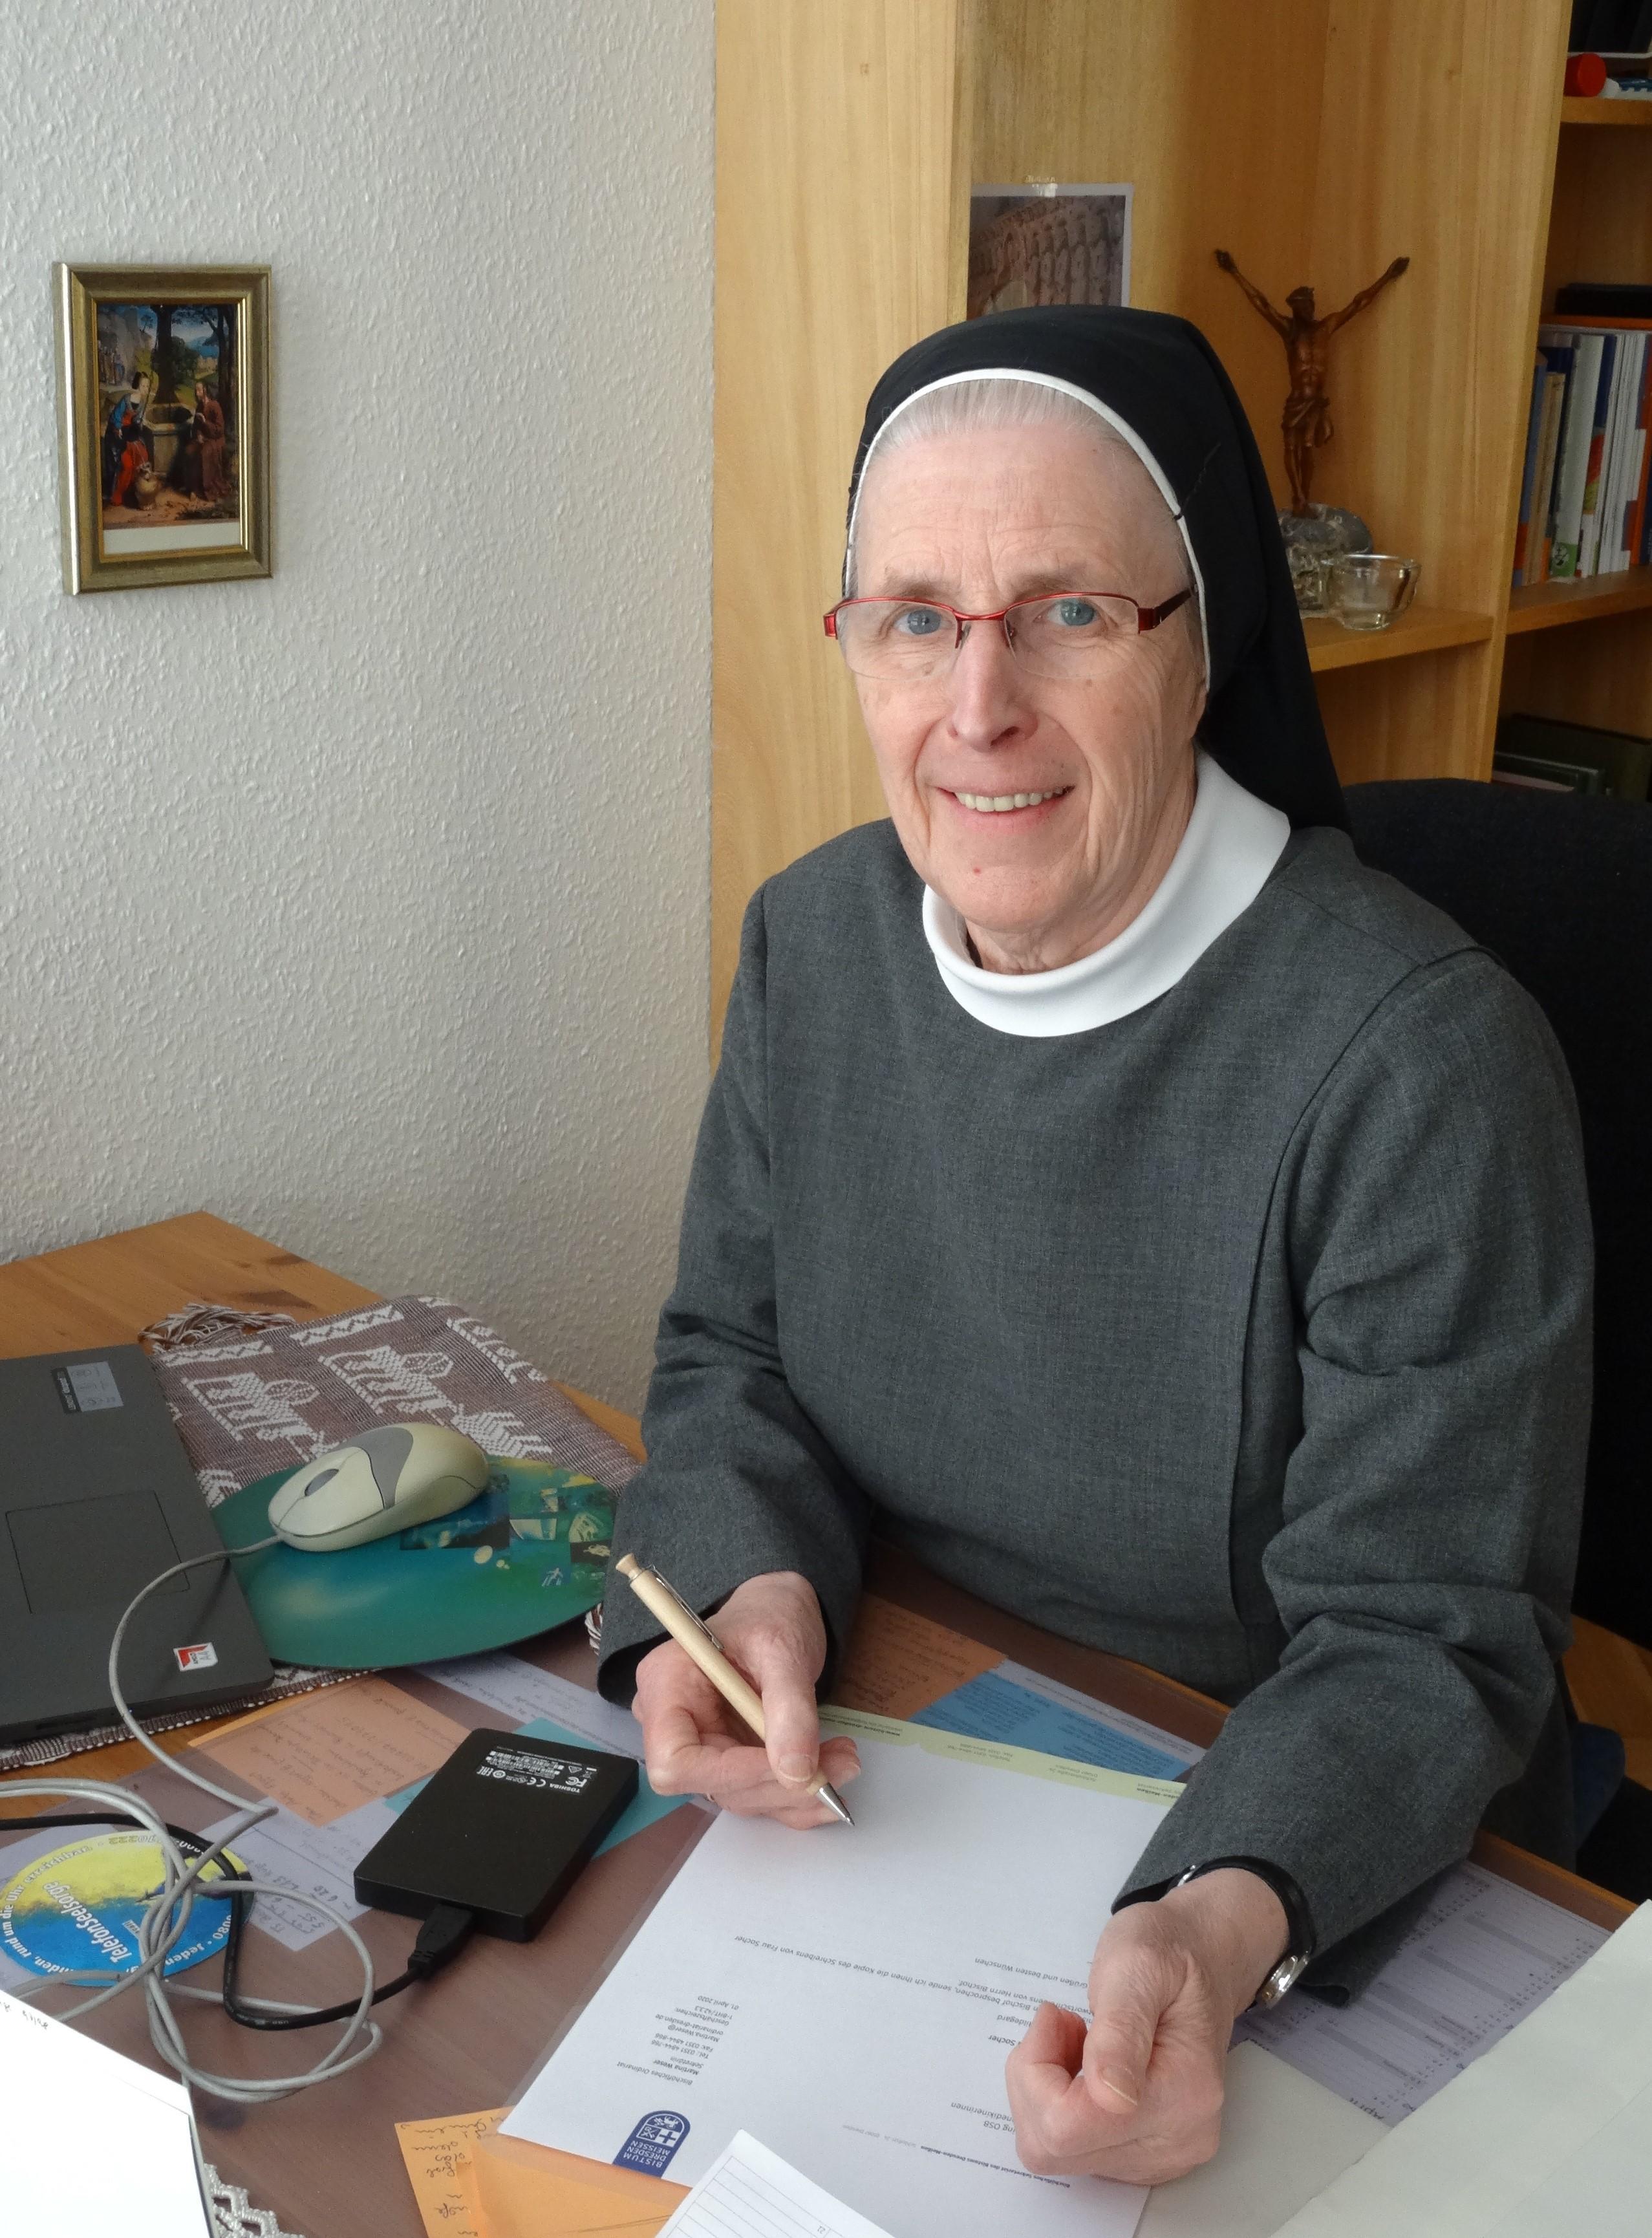 Sr. Hildegard Jansing